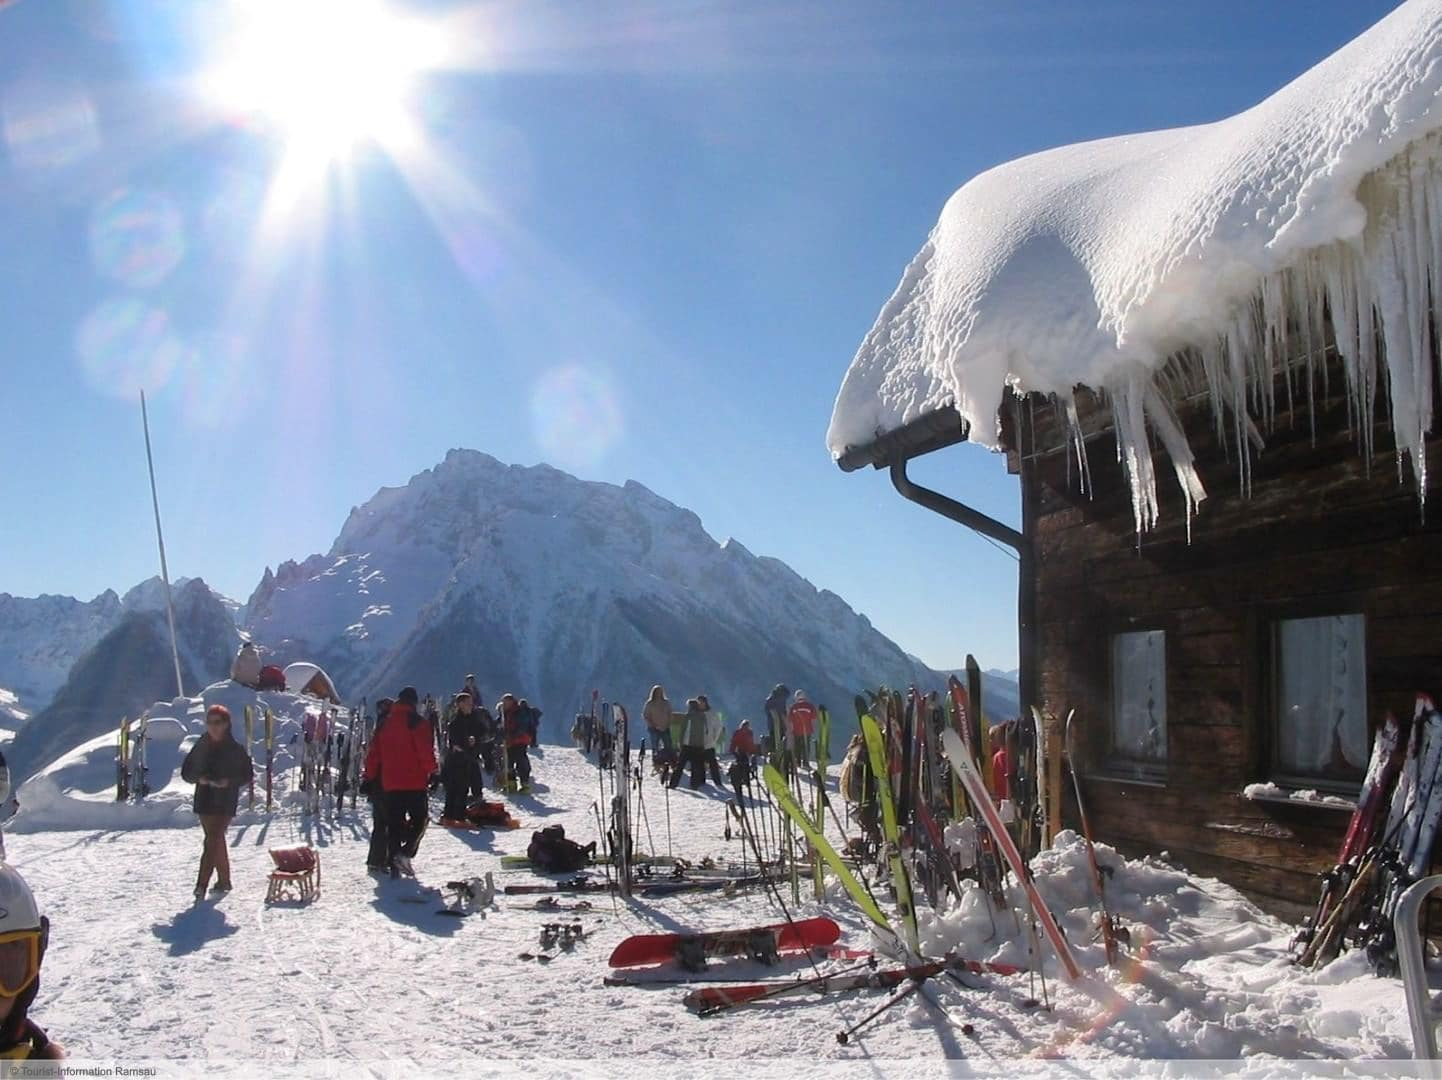 après-ski in Schönau am Königssee